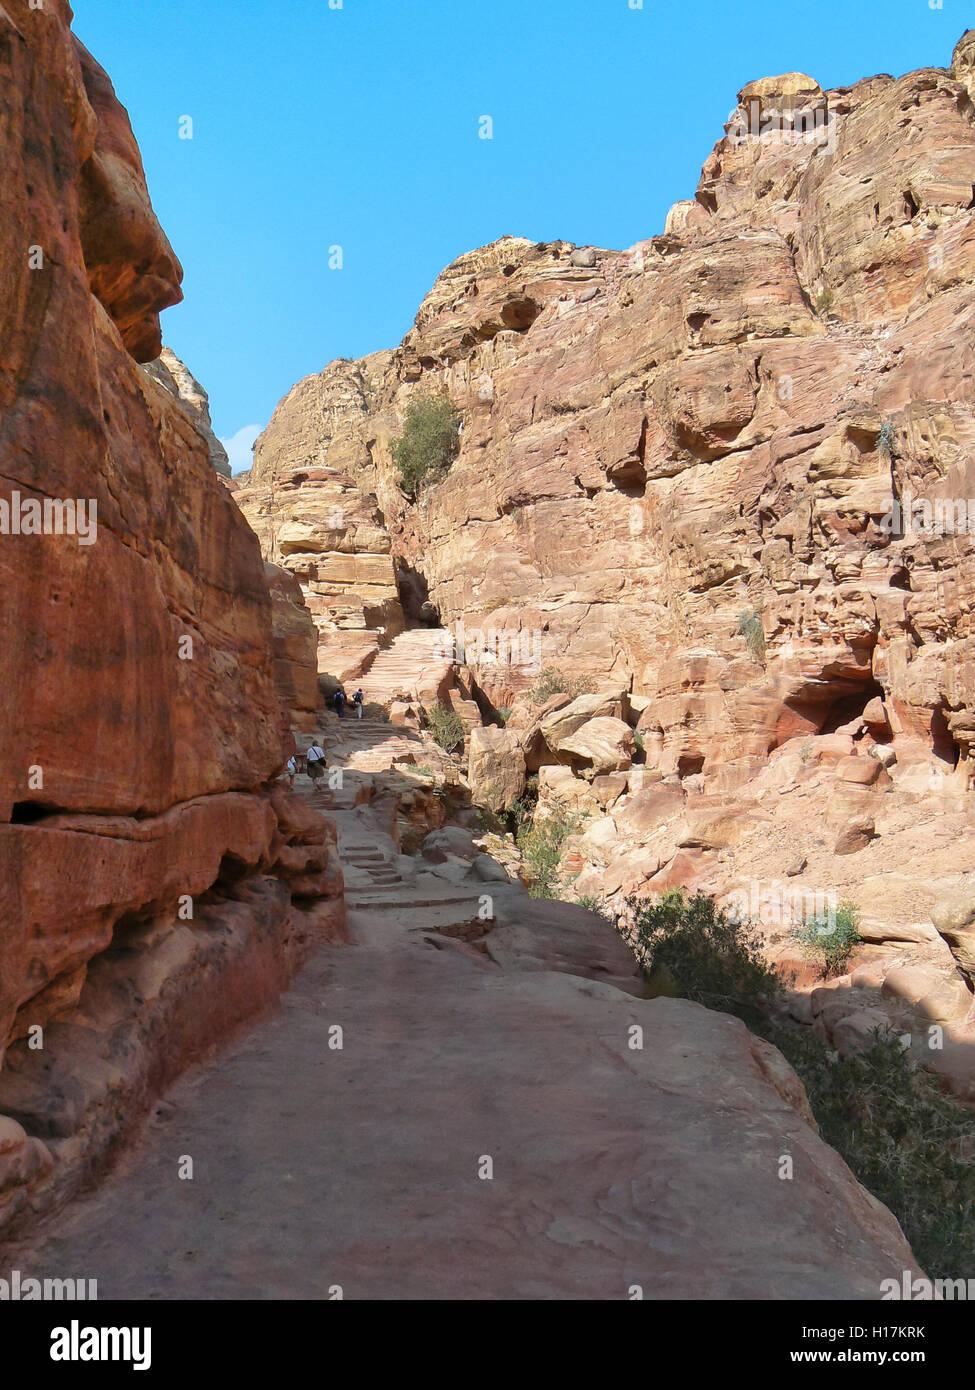 Pathway to the monastery El Deir at Petra, Jordan - Stock Image